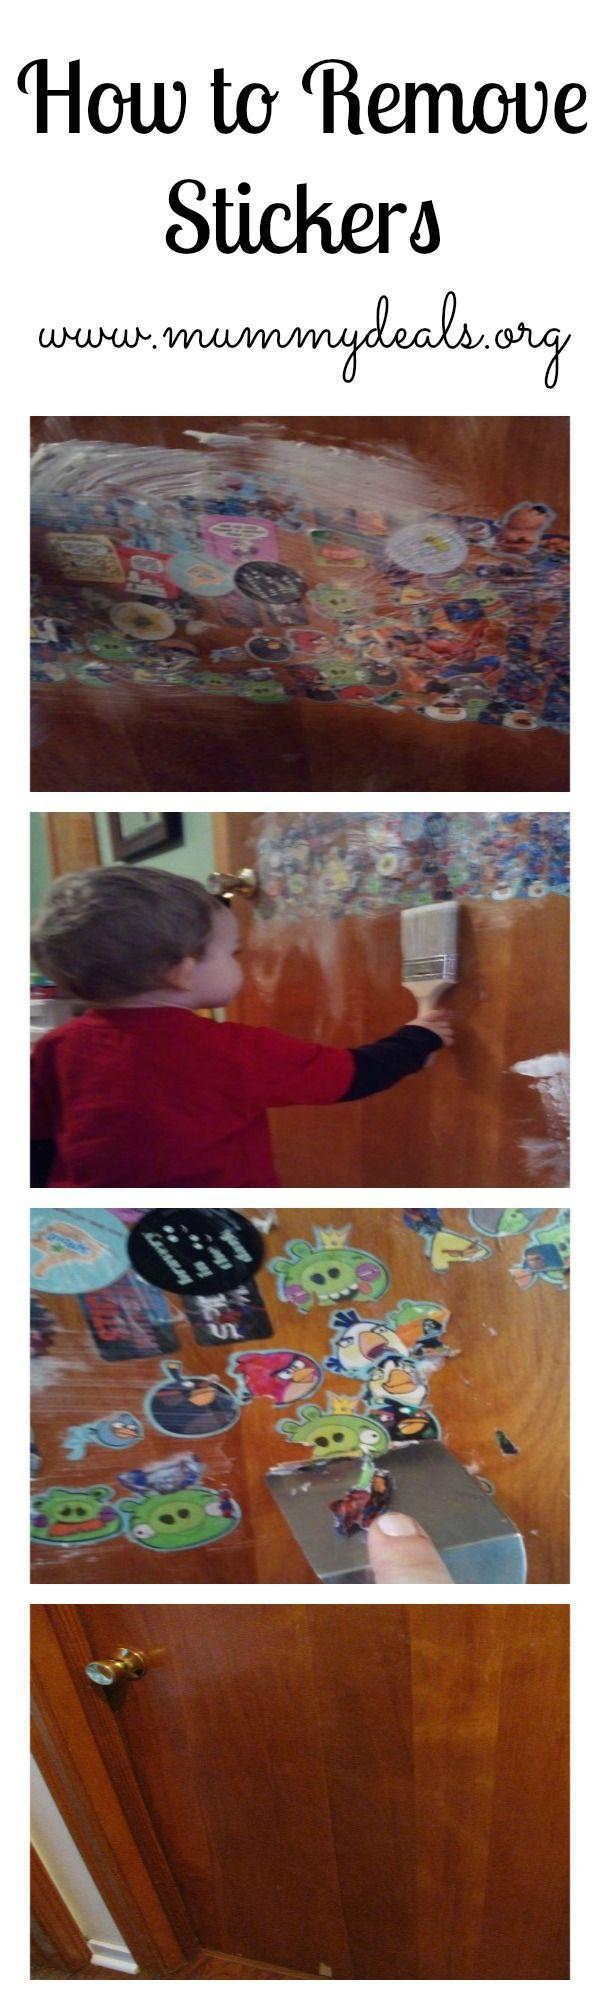 How To Remove Stickers Mummy Deals Sticker Removal Diy Cleaning Products Diy Cleaning Products Recipes [ 2000 x 600 Pixel ]